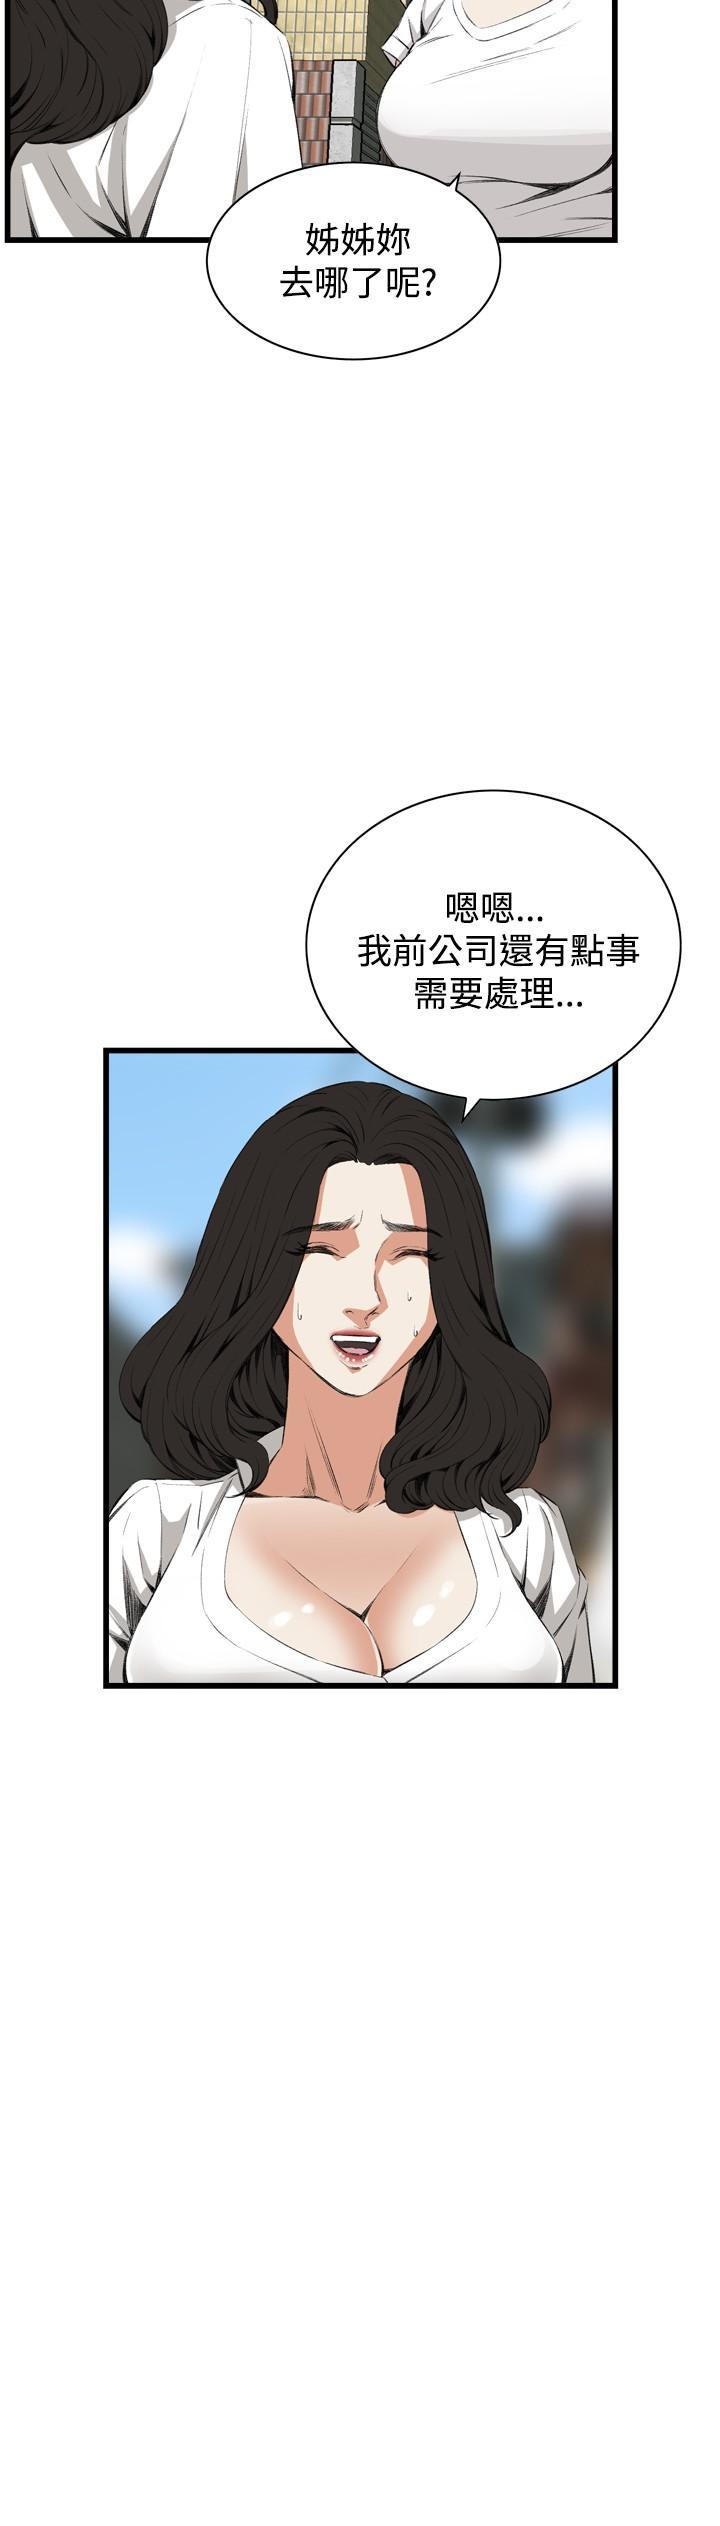 Take a Peek 偷窥 Ch.39~55 [Chinese]中文 411